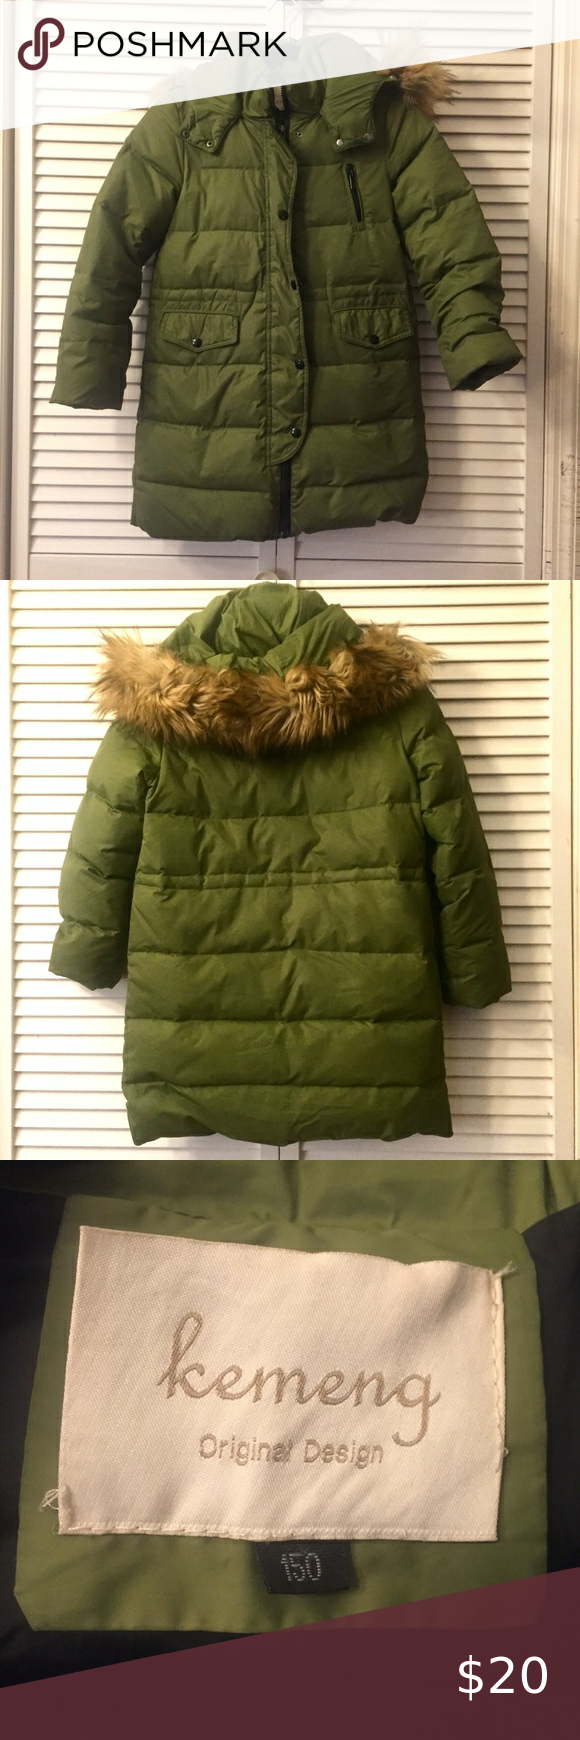 10 11 Girl Winter Green Down Long Puffer Jacket Long Puffer Long Puffer Jacket Puffer Jackets [ 1740 x 580 Pixel ]